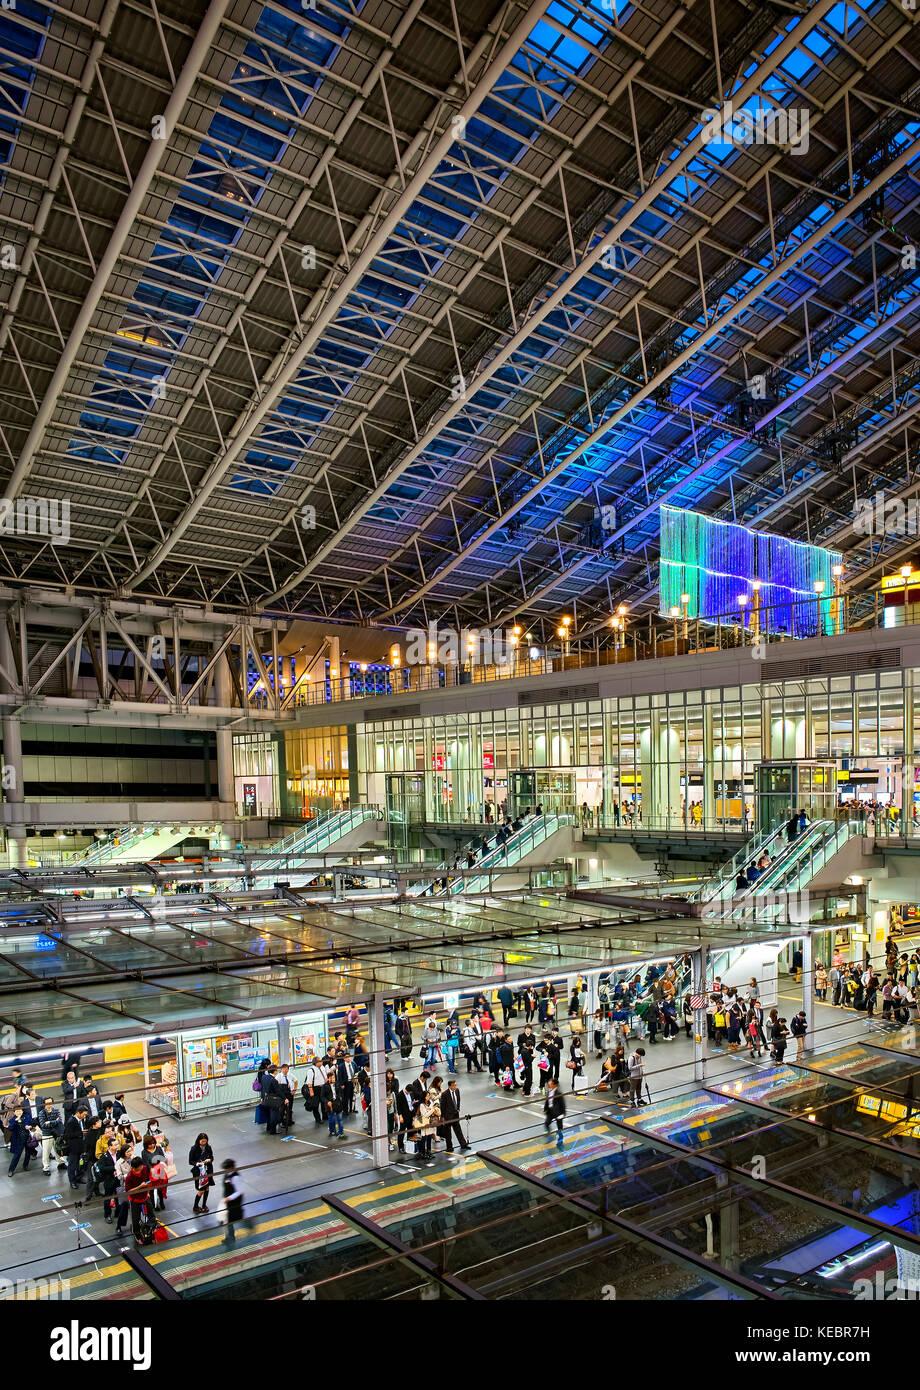 Japan, Honshu island, Kansai, Osaka, the railway station, the platforms. - Stock Image